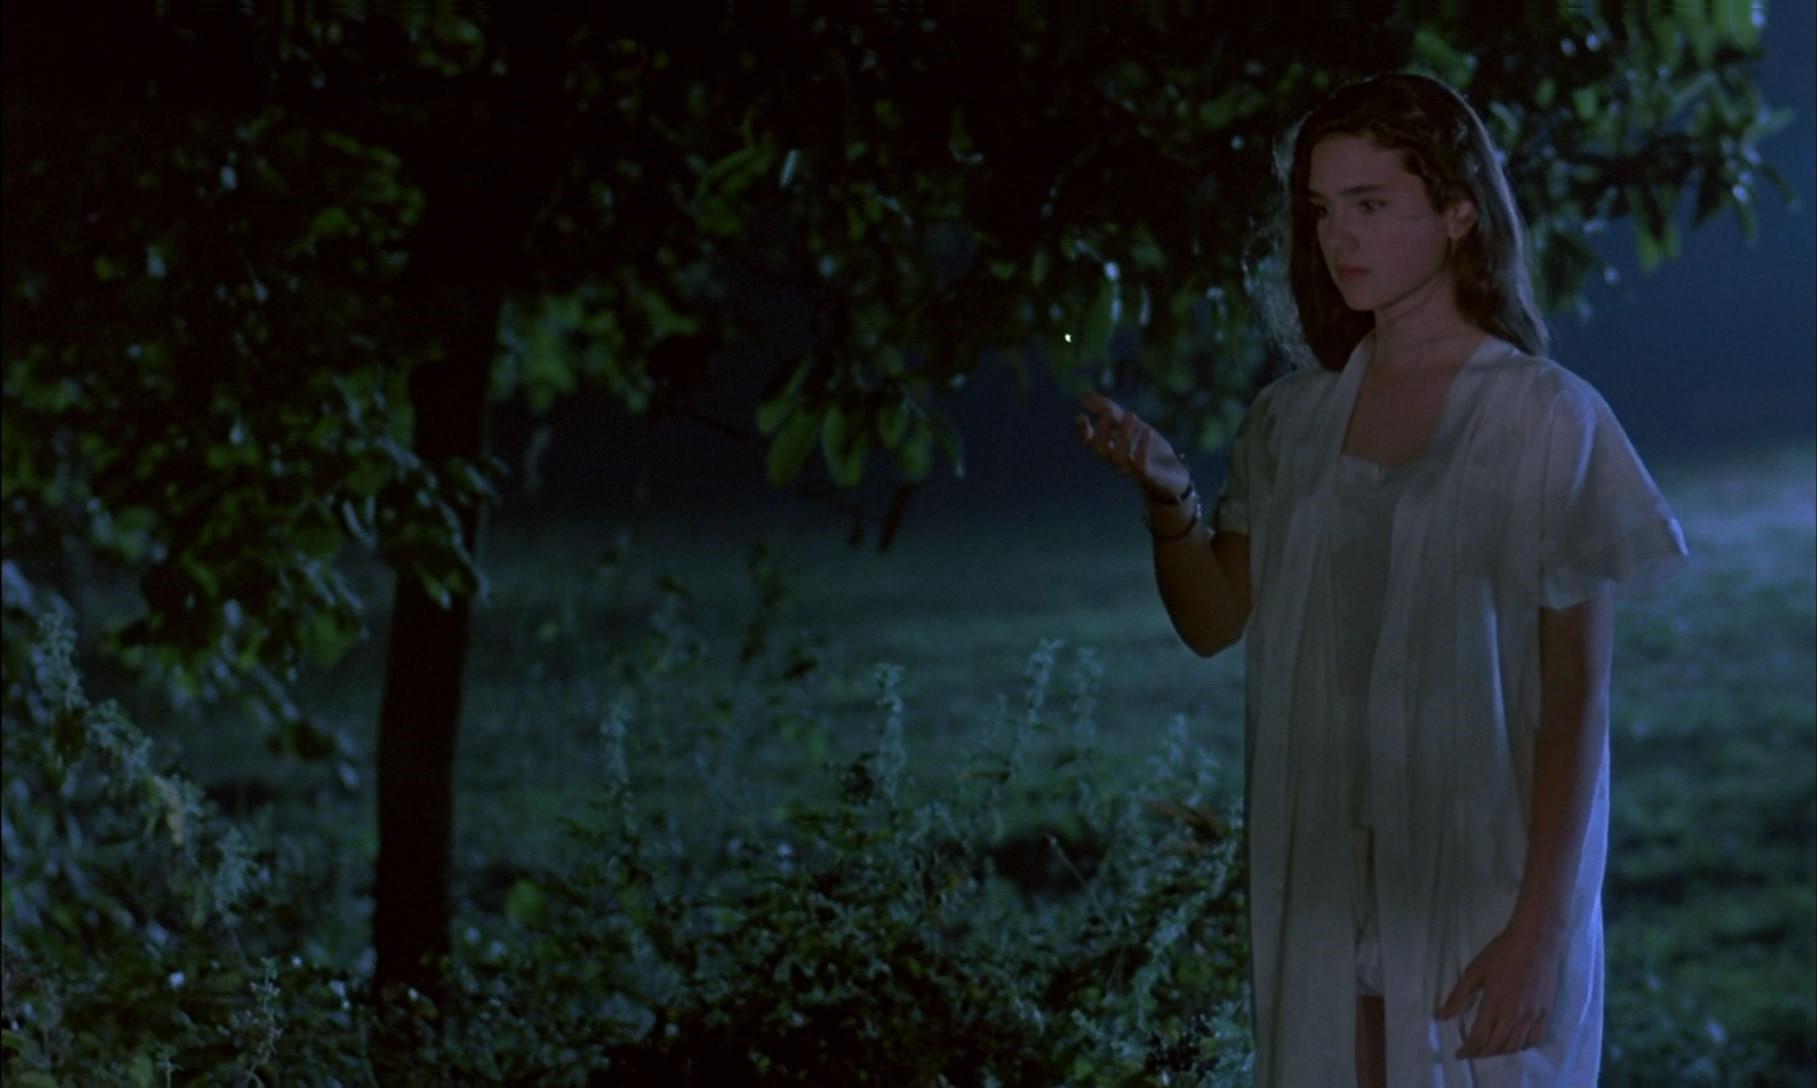 Jennifer siguiendo una luciernaga.